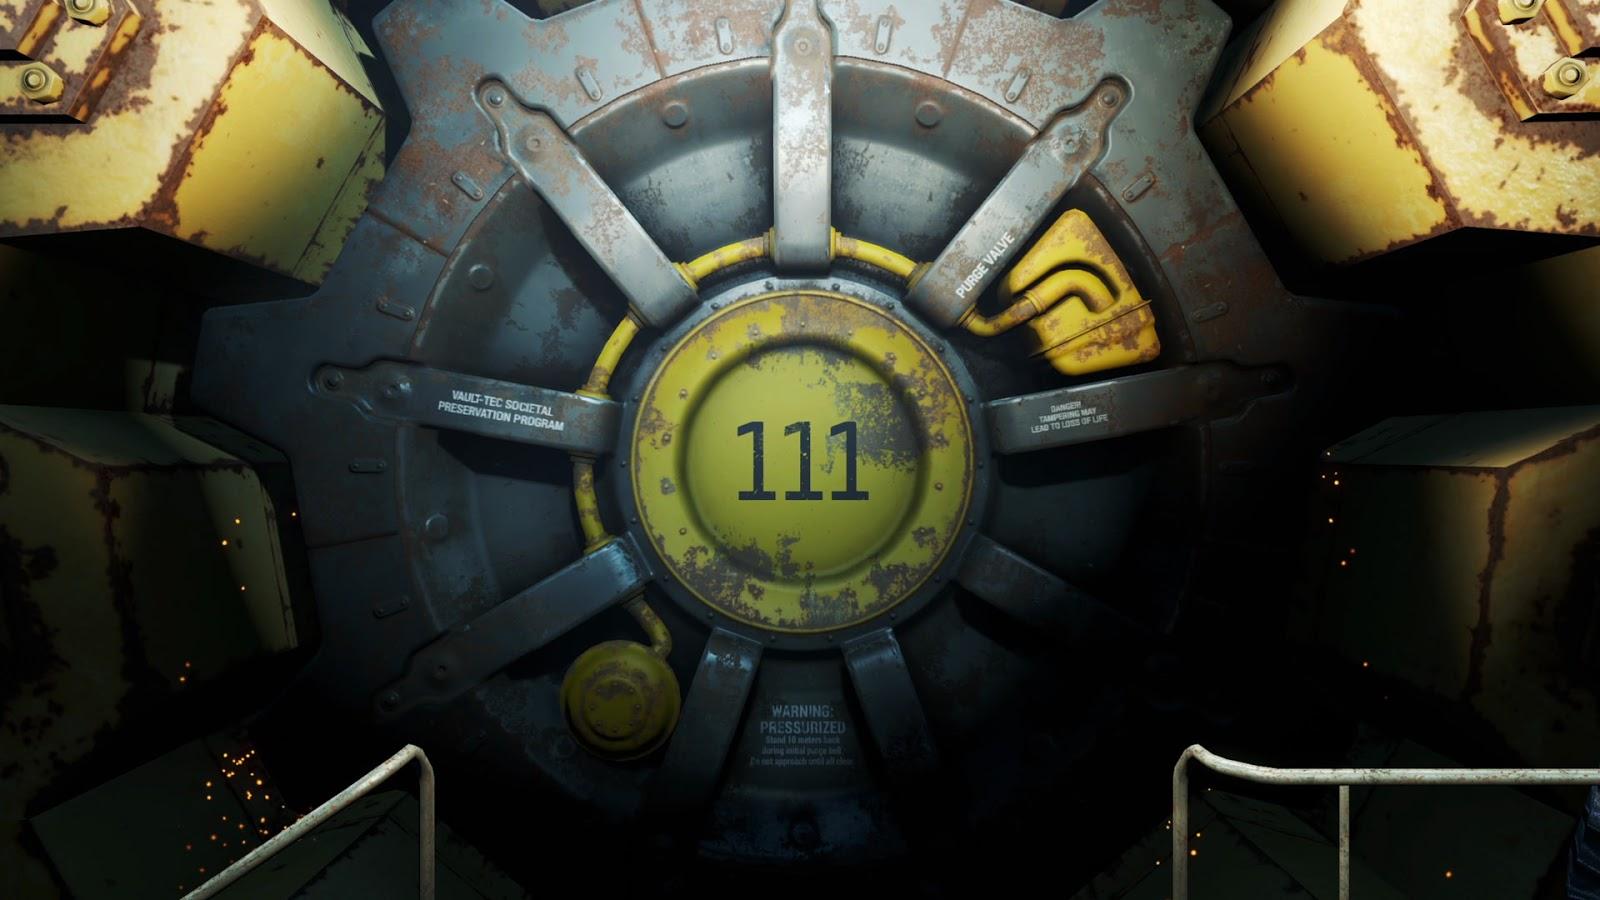 fallout 4 games wallpaper